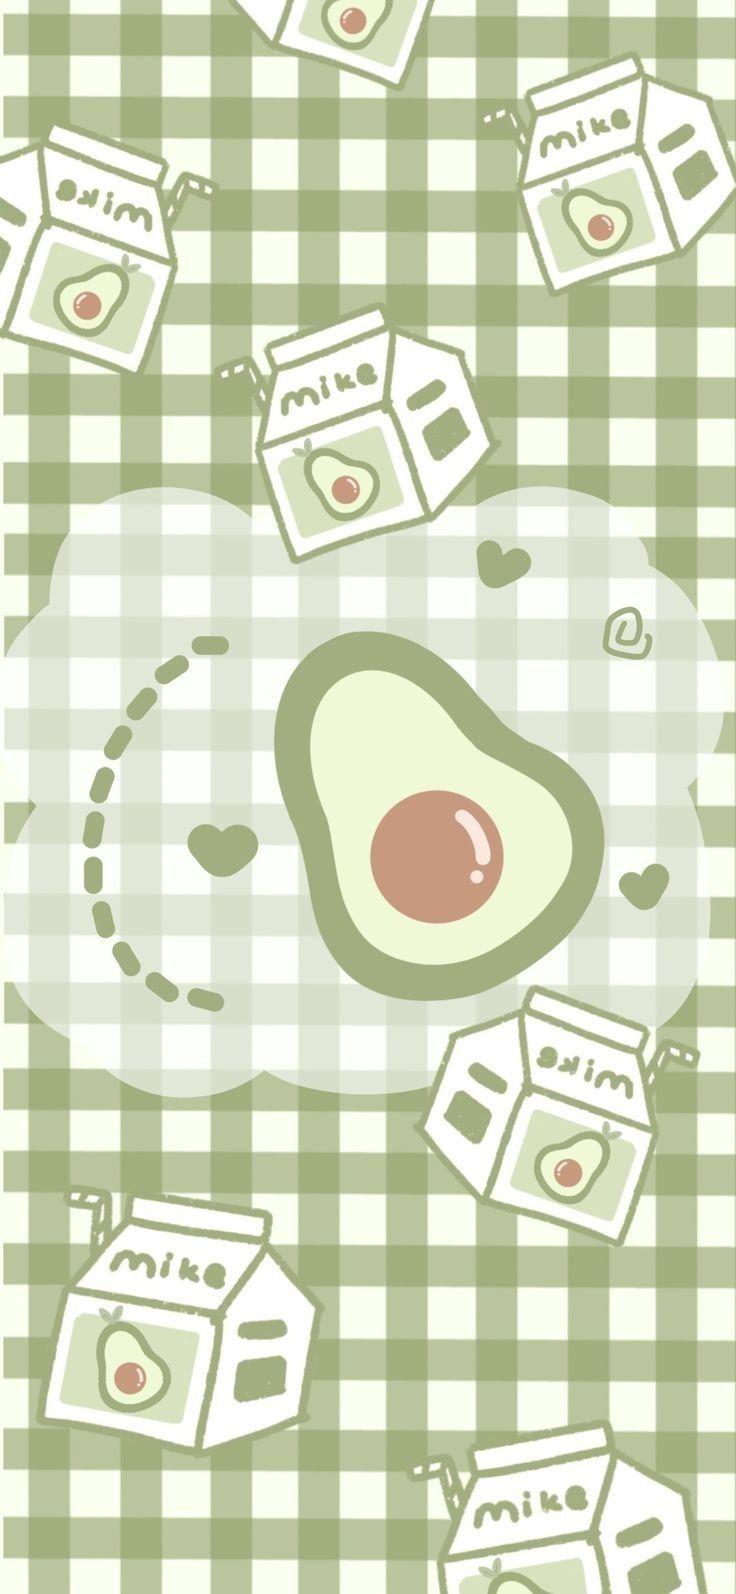 Pin Oleh 𝓗𝒾ề𝓃 Di Minh Họa Và áp Phích | Wallpaper Kartun, Kartu Lucu, Ilustrasi Lucu 10A